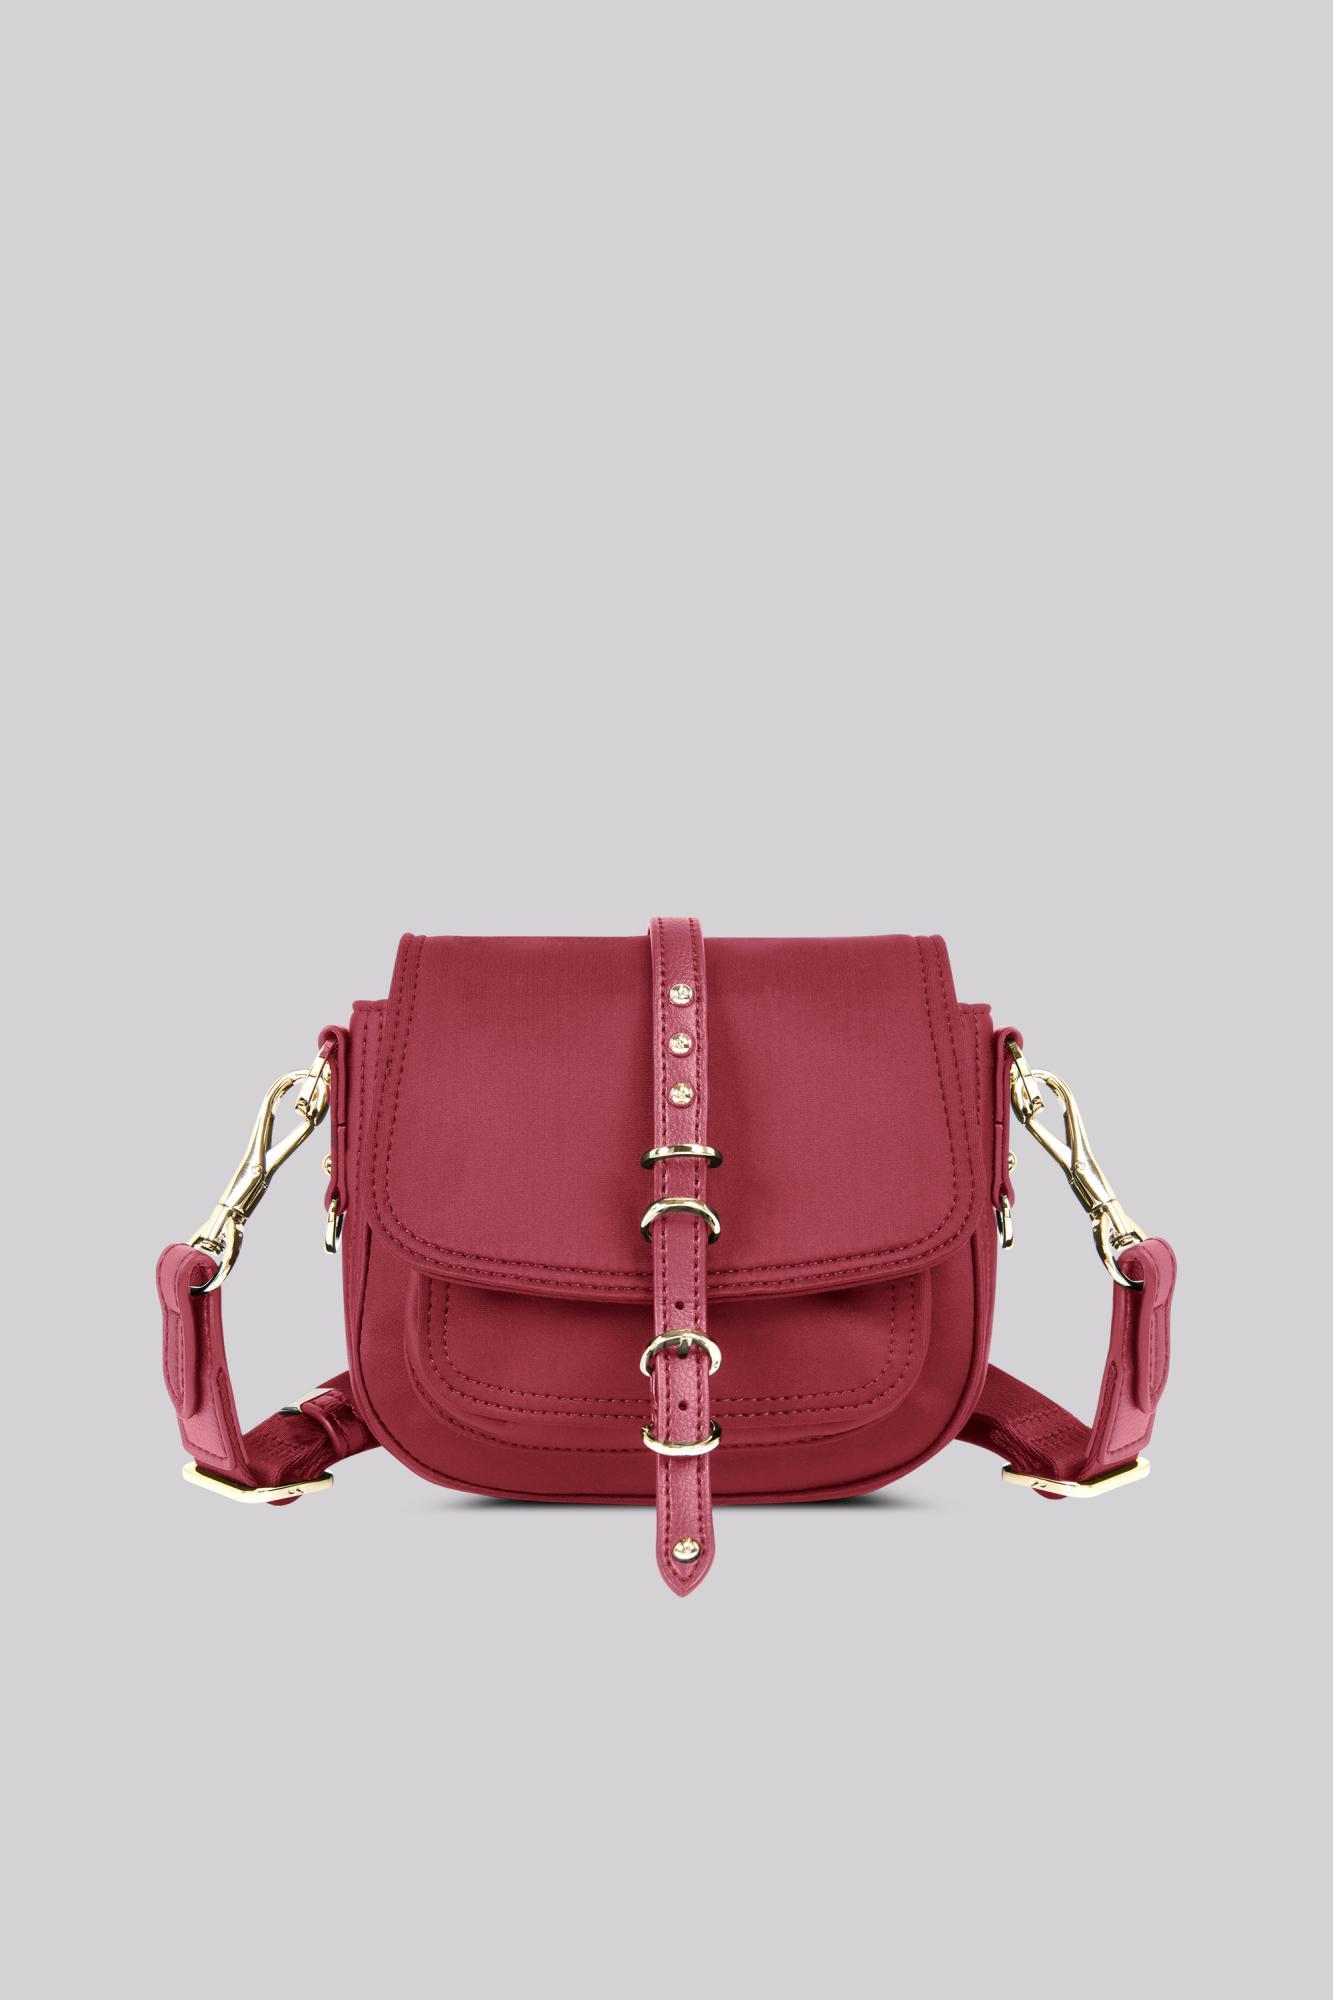 Mini Bag  BORDEAUX Her Bag